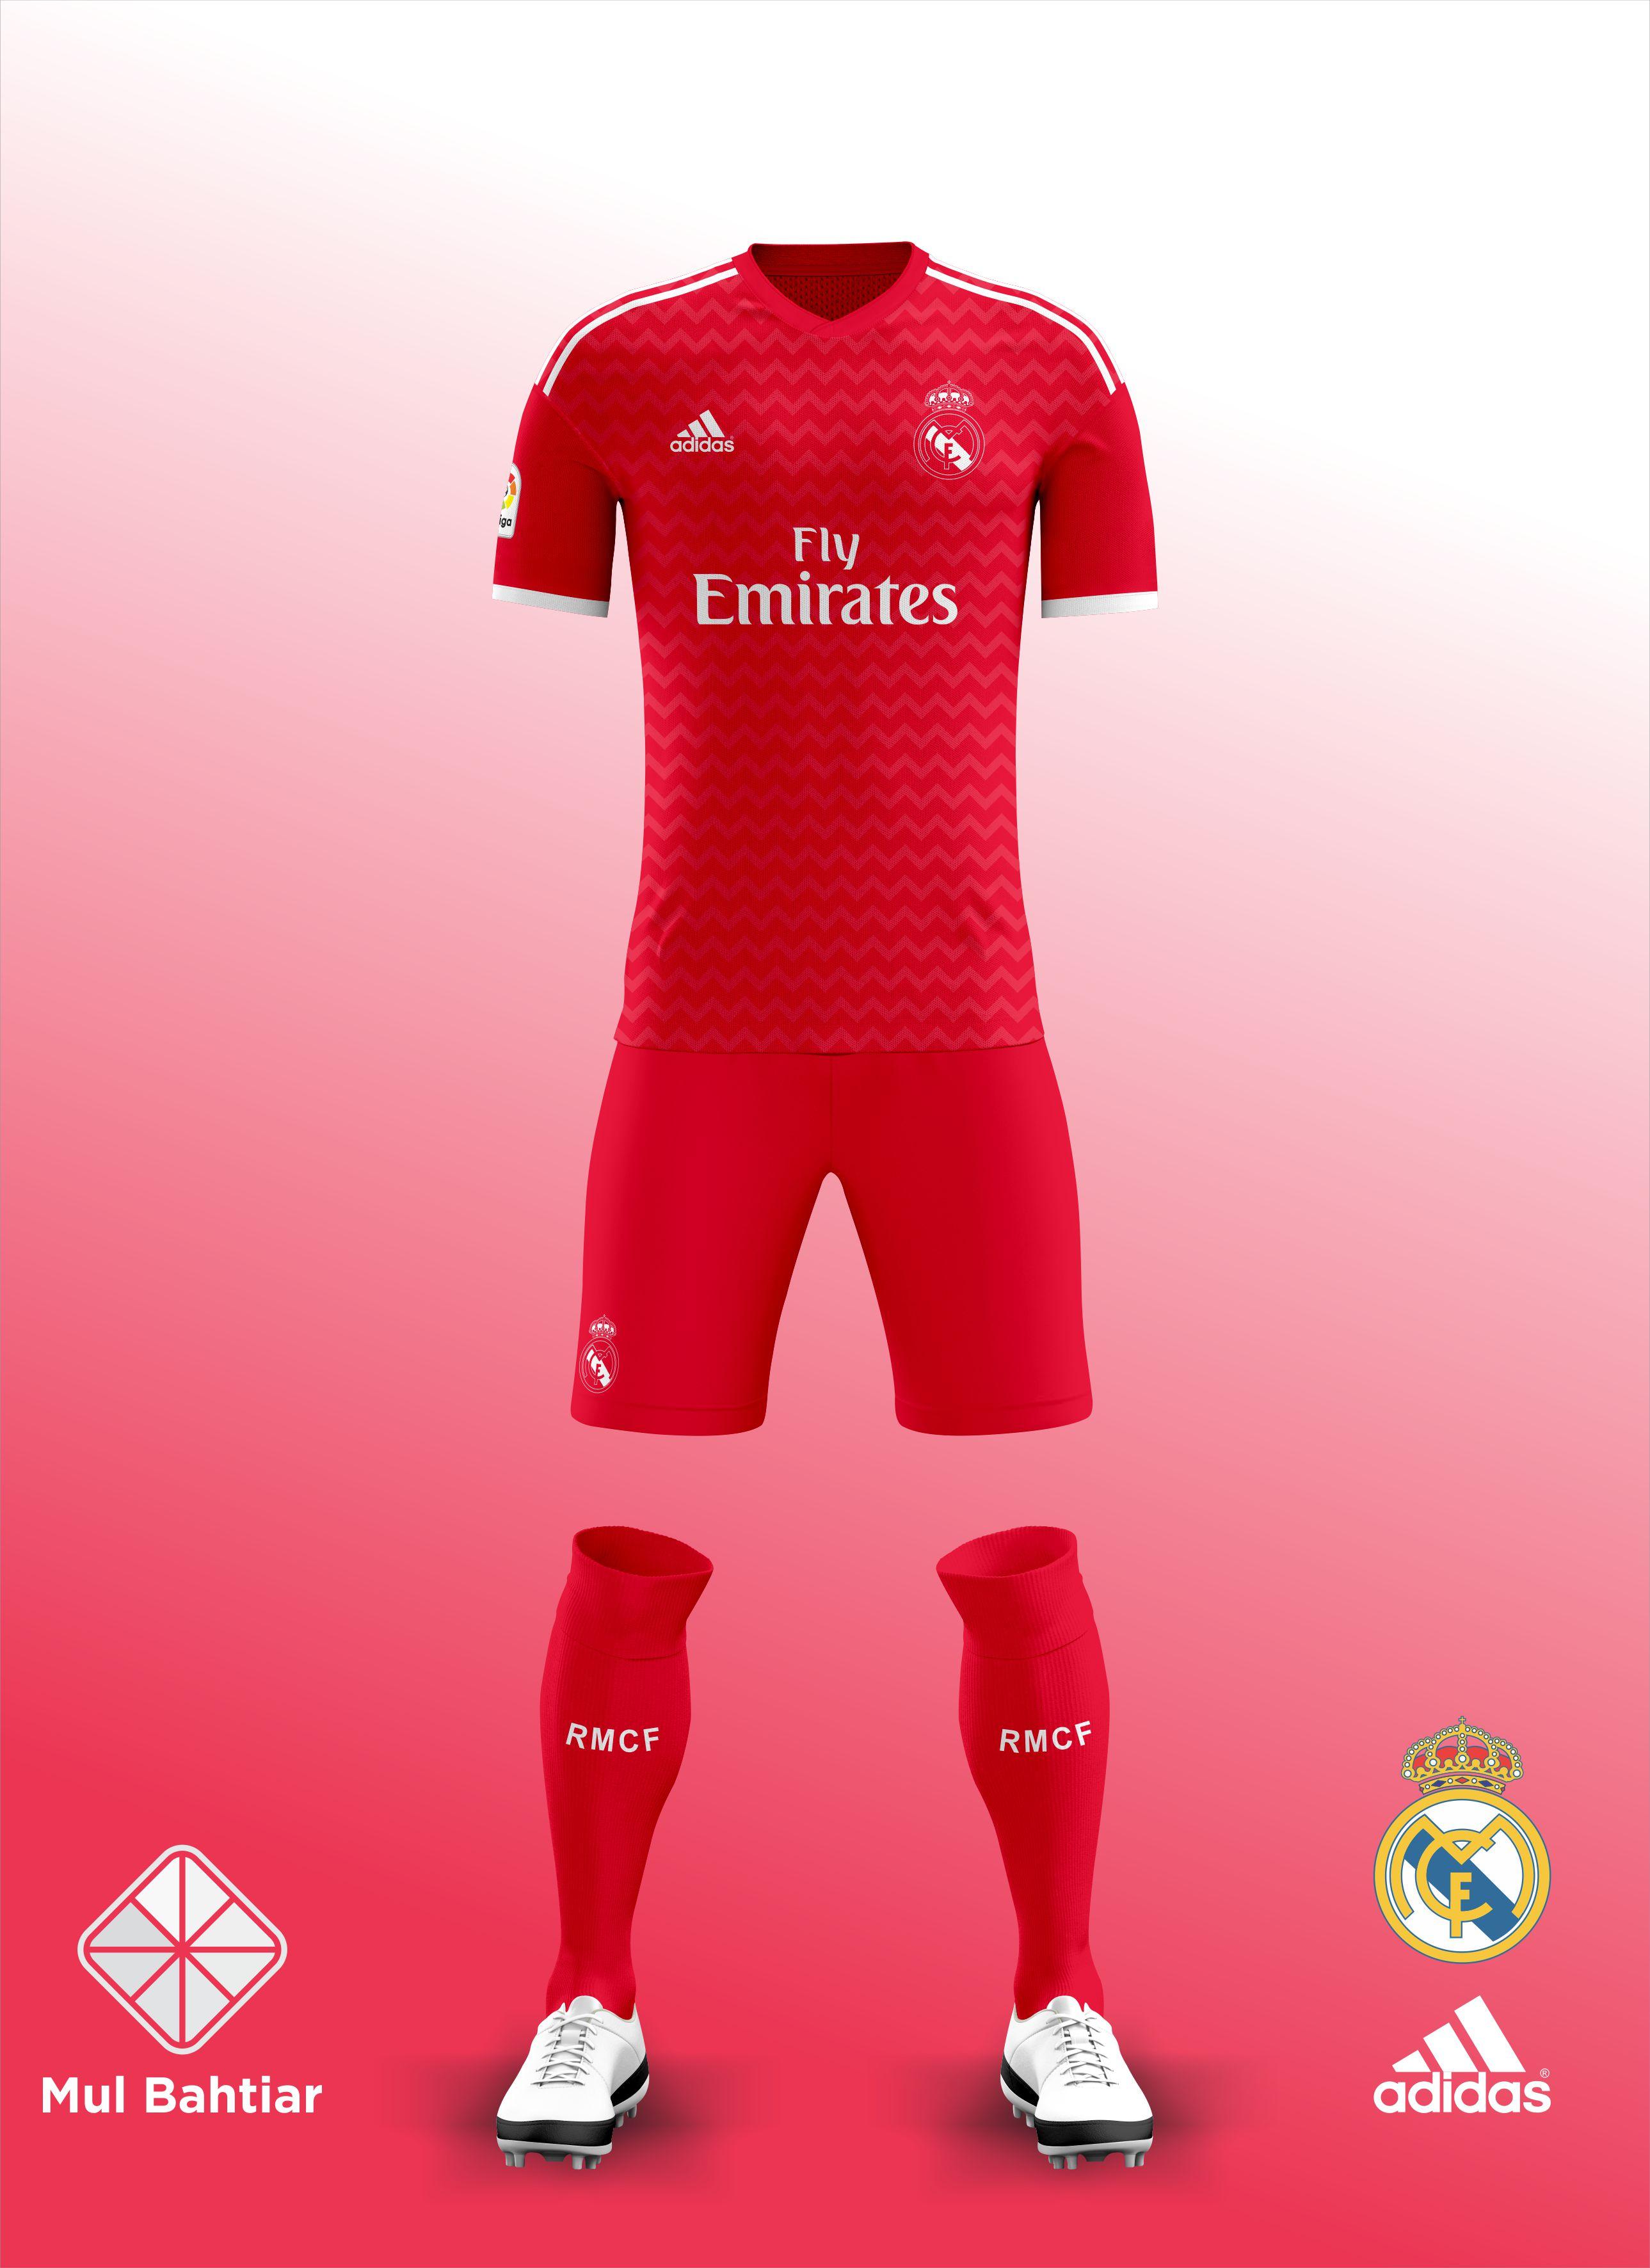 55e9e8a9f17 Real Madrid 2018-2019 Third Kit Leaked